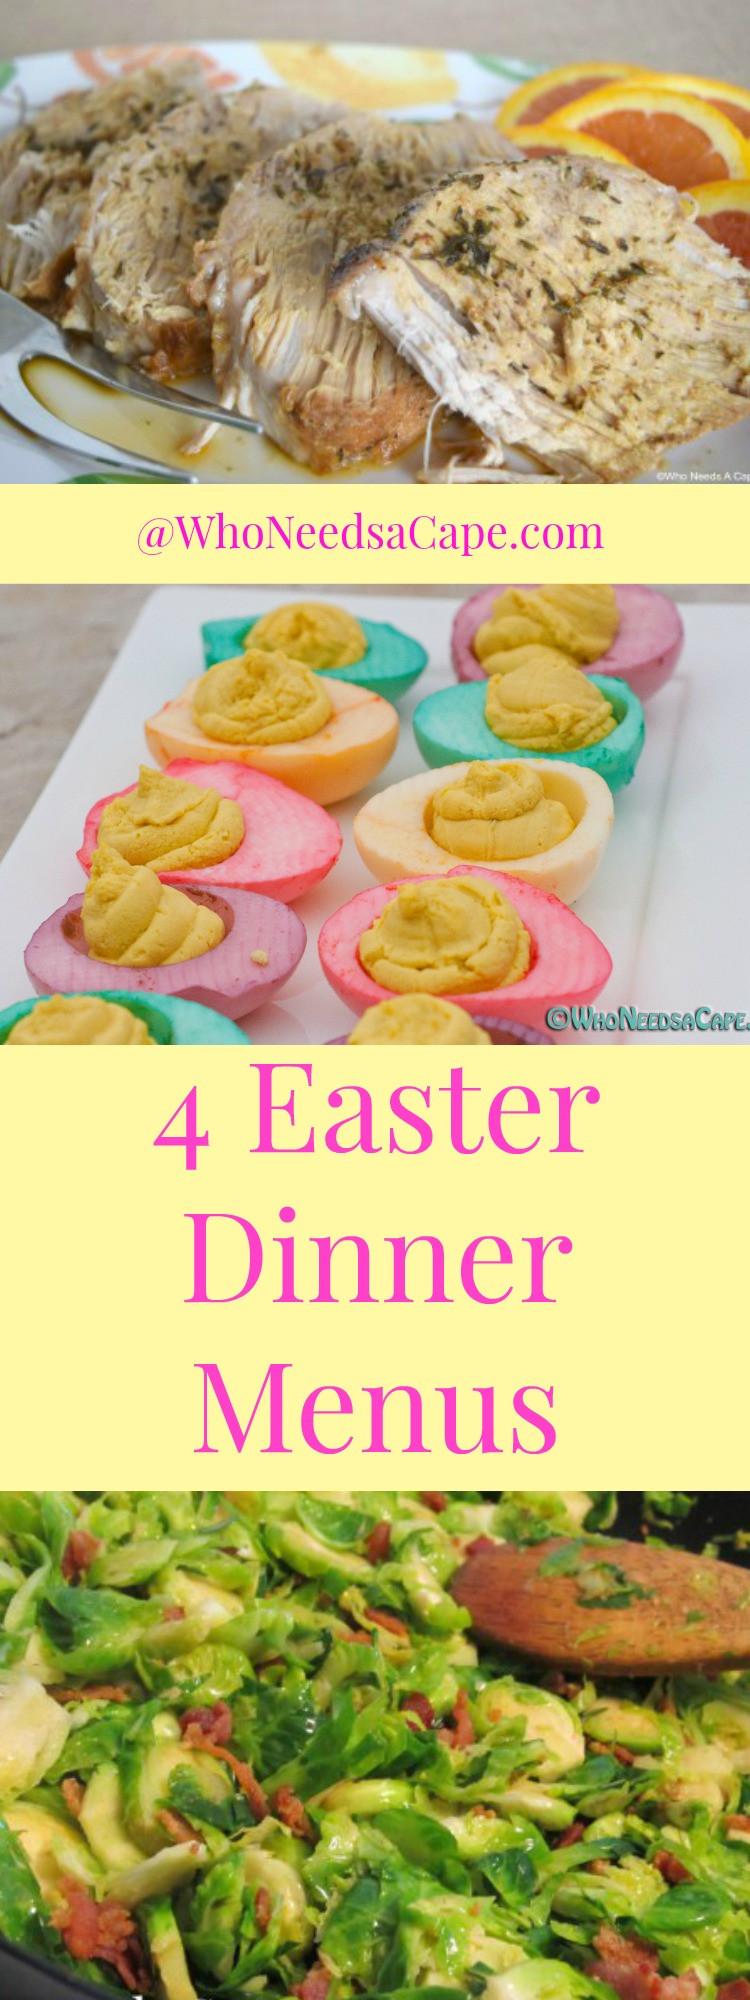 Easter Dinner Menu  Easter Dinner Menus Who Needs A Cape